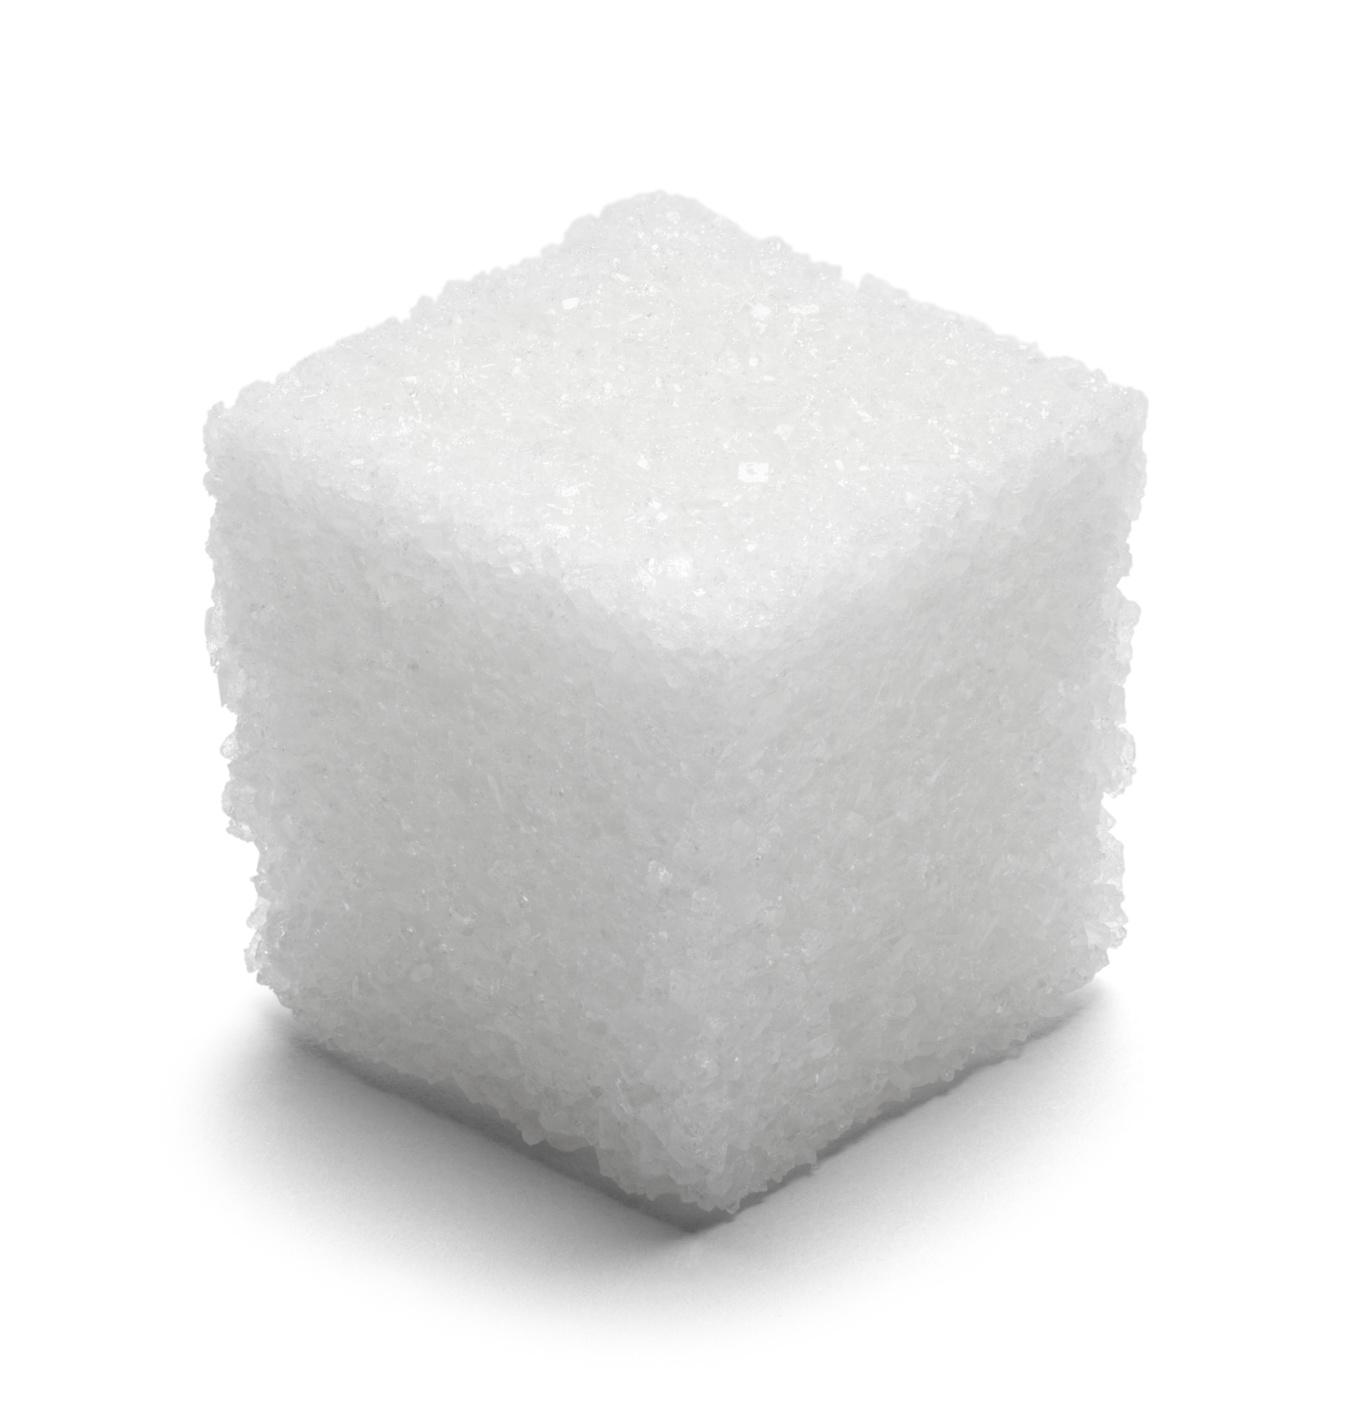 Single Cube of Sugar Isolated on White Background.